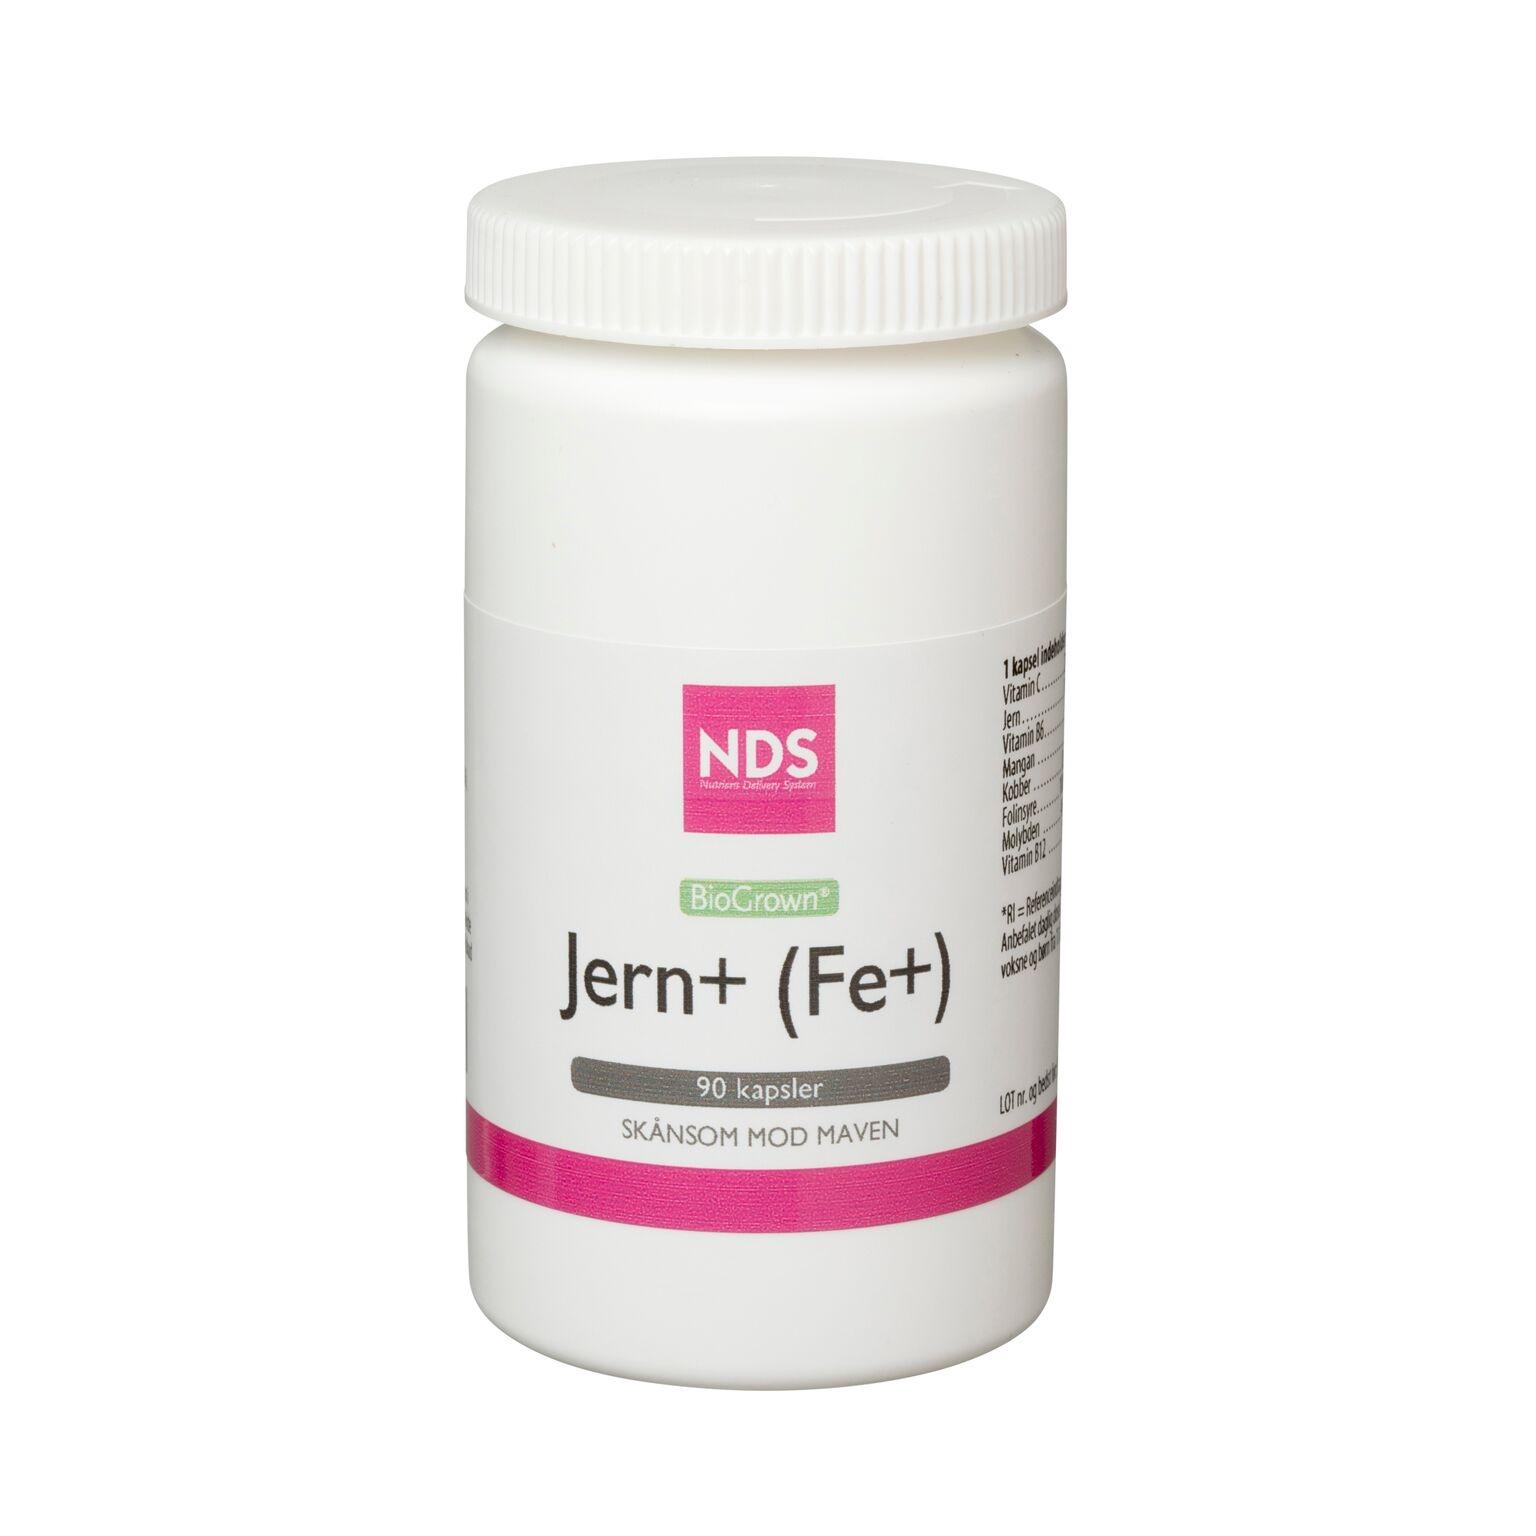 NDS Fe + Jern - 90 tabletter